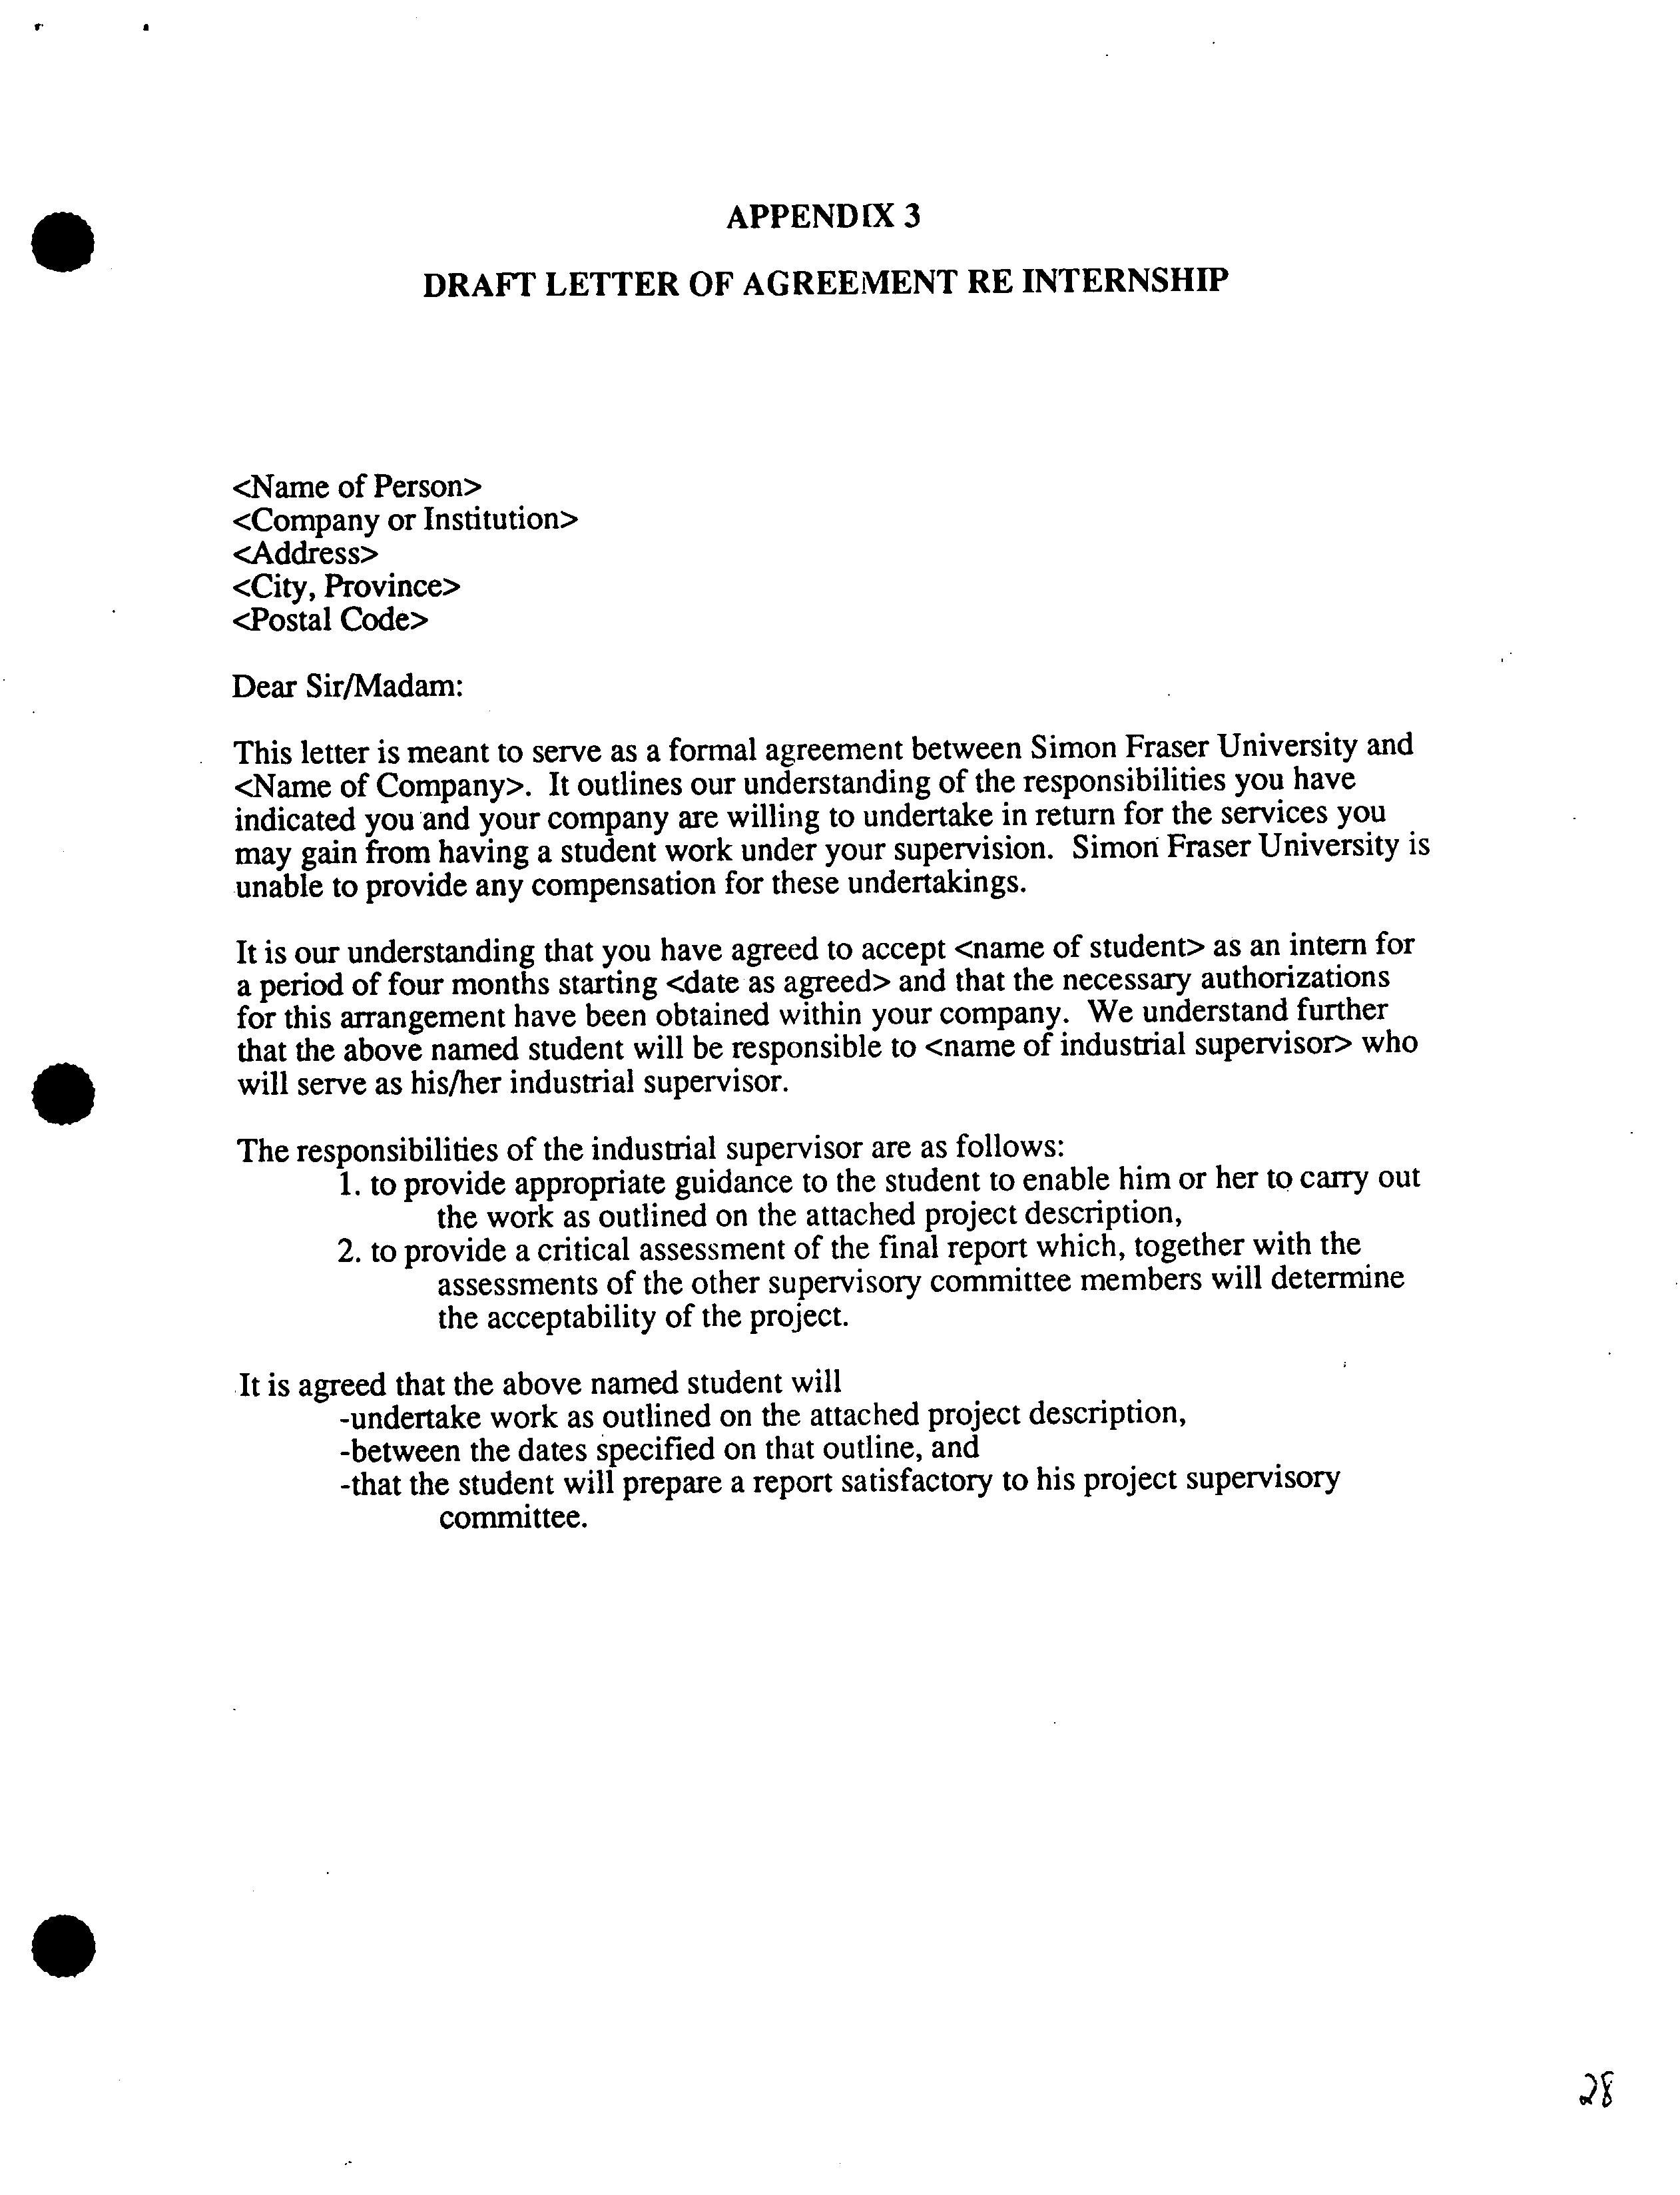 intern evaluation letter seatle davidjoel co